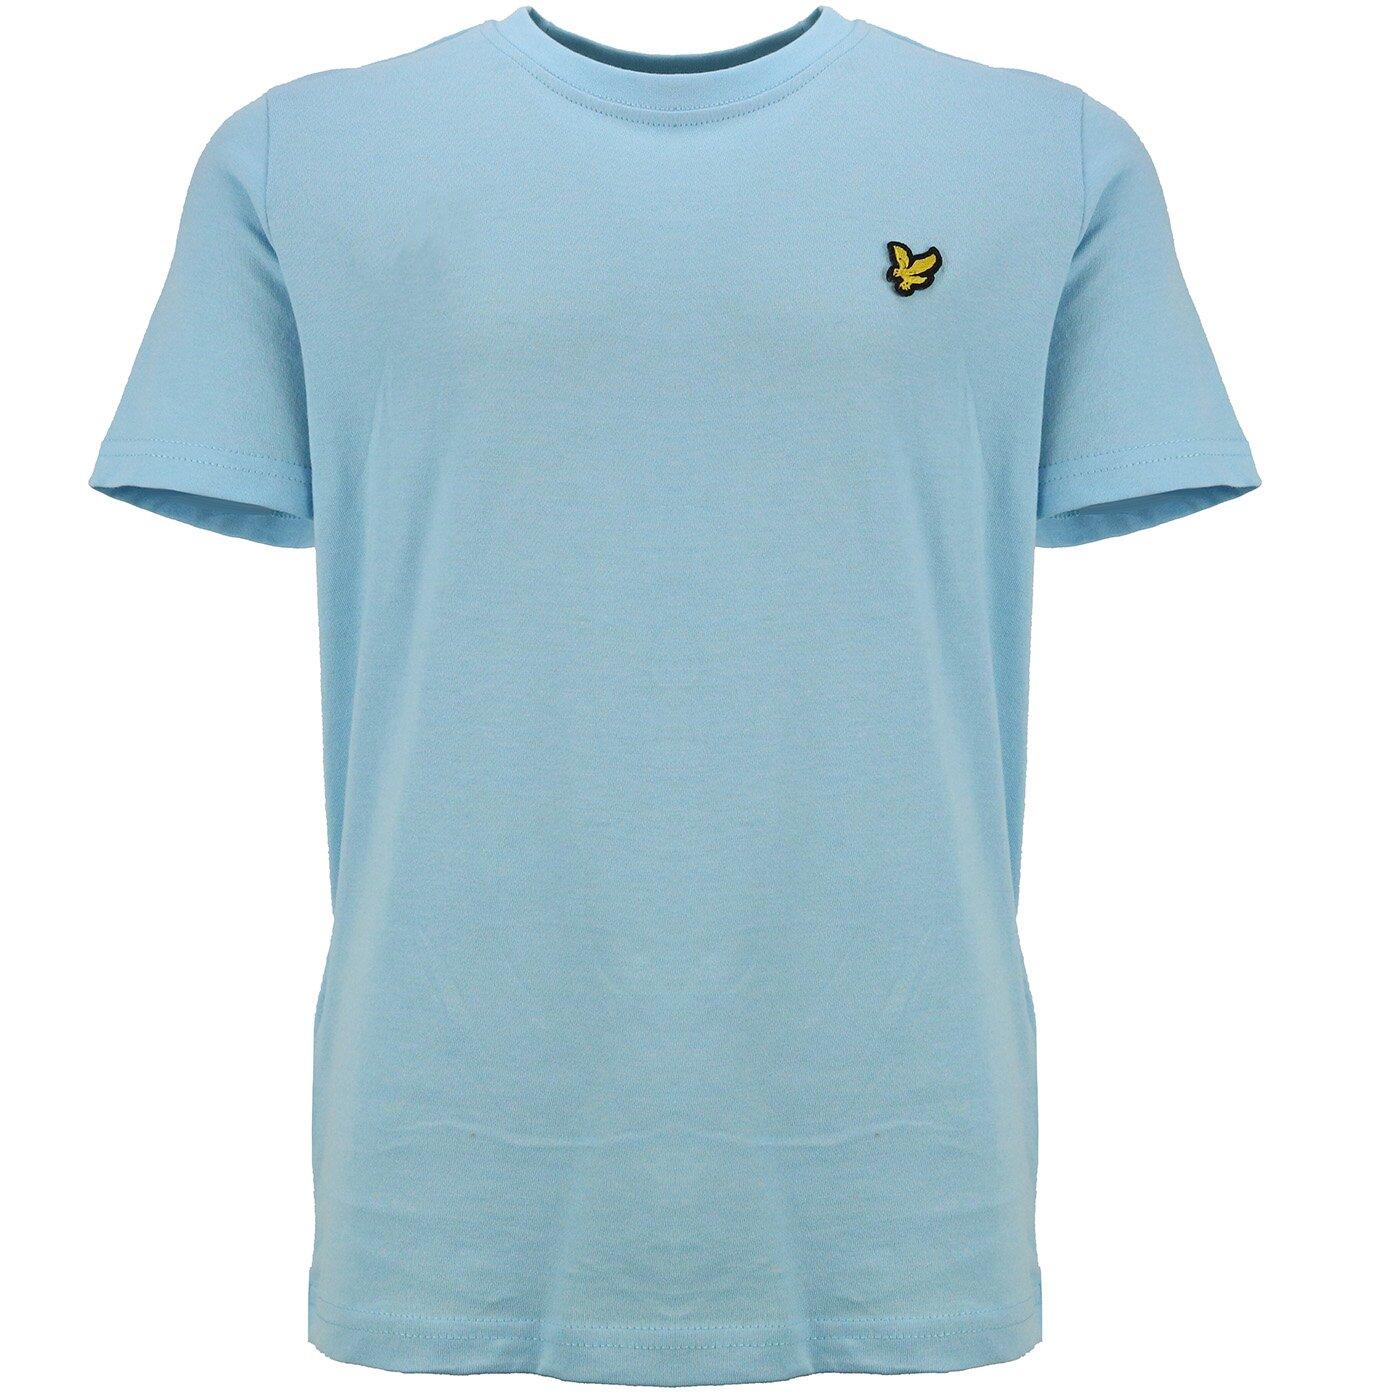 Lyle & Scott shirt sky blue LSC0003S